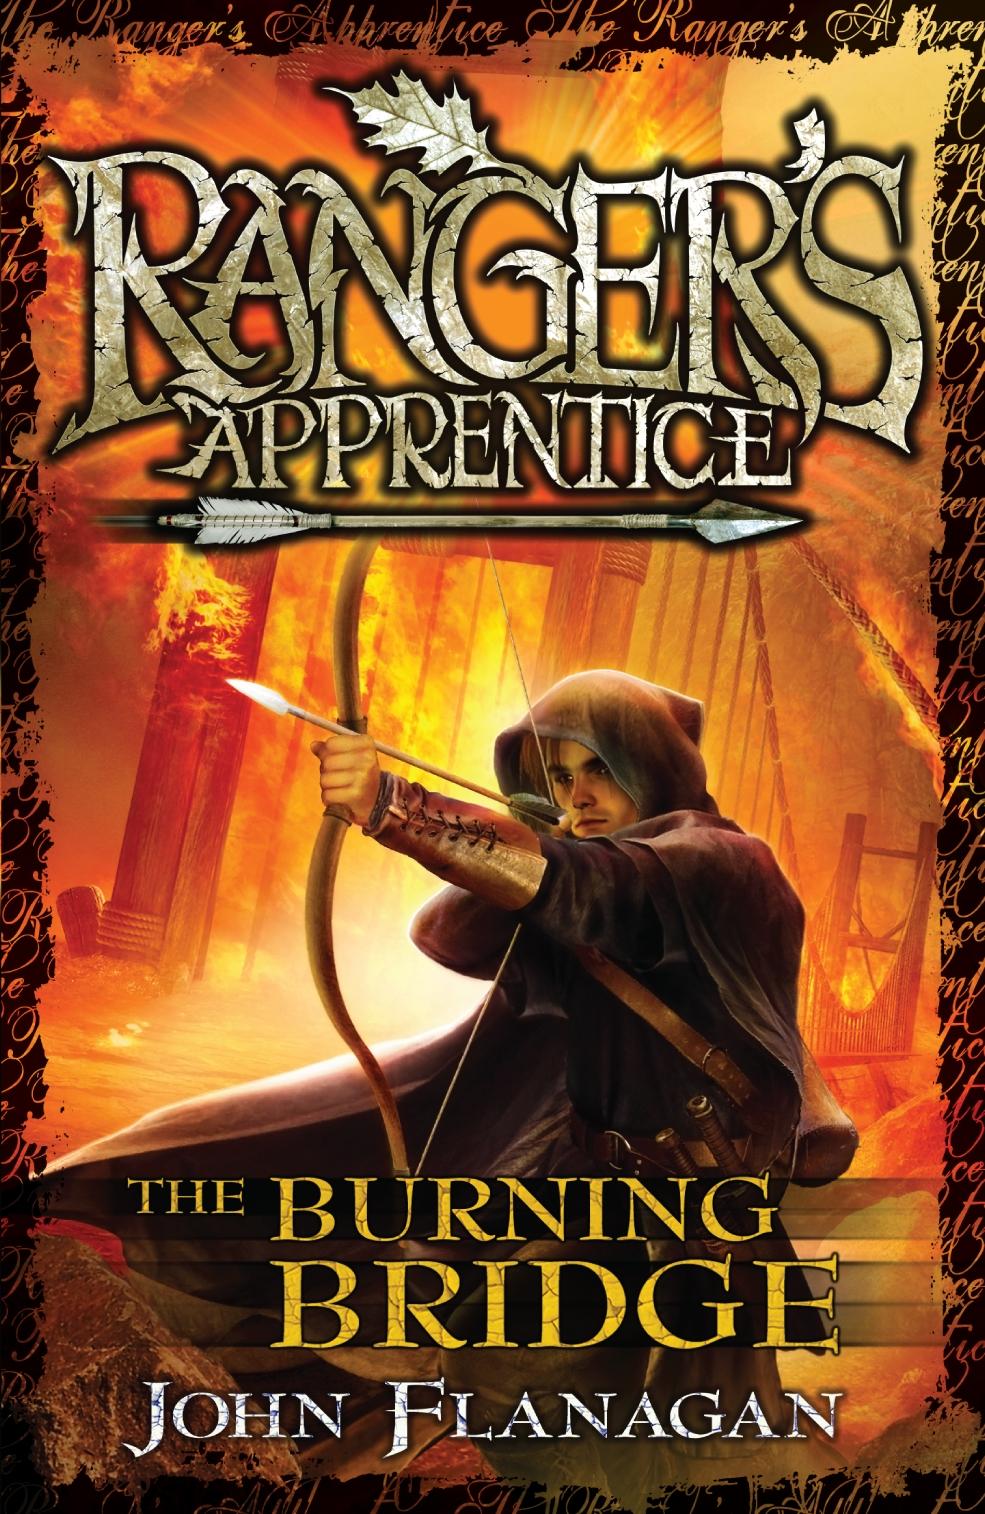 Ranger's Apprentice 2: The Burning Bridge